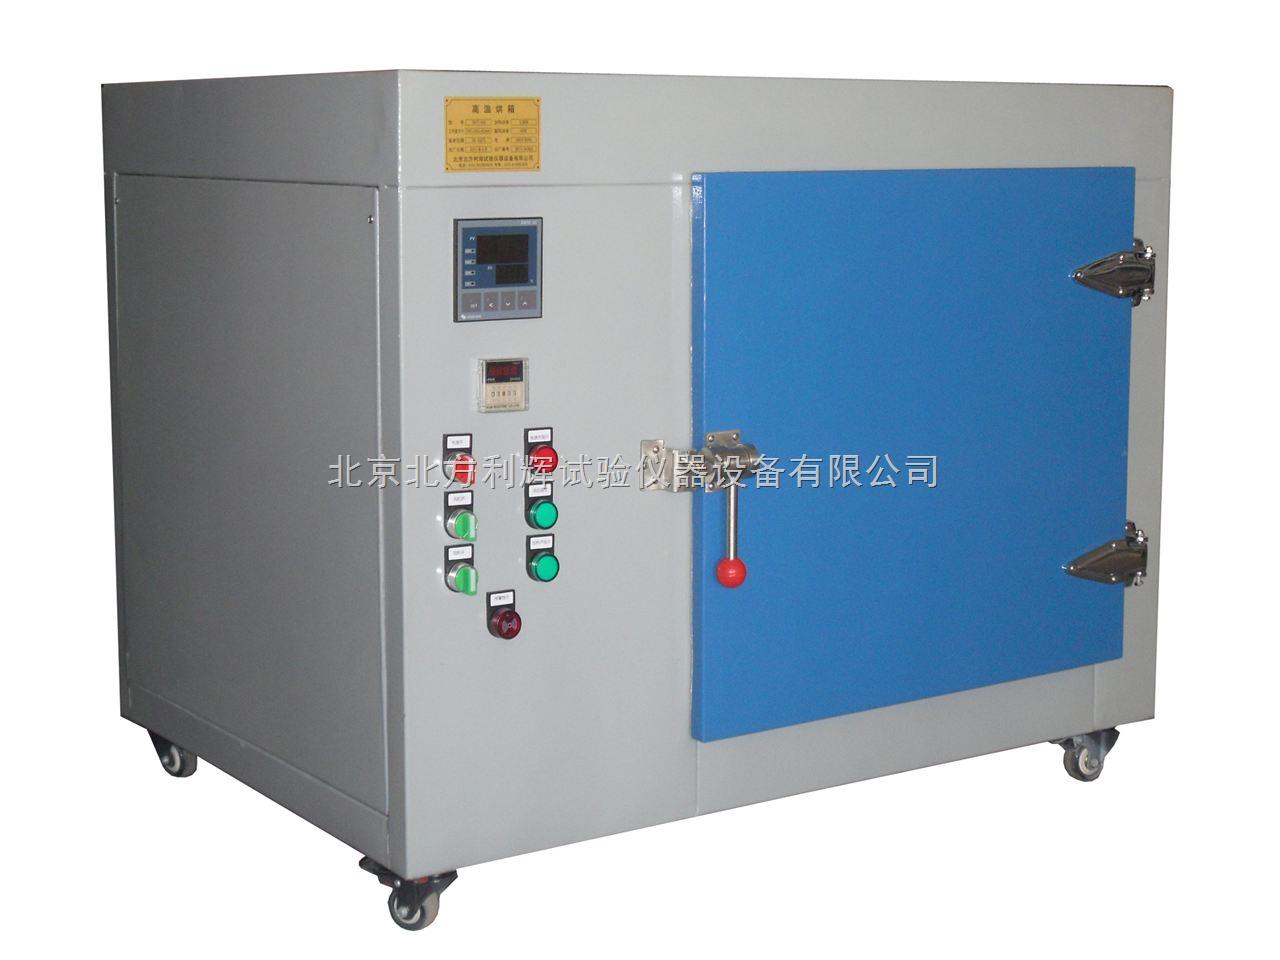 GWH-406 北京400度高温箱生产厂家